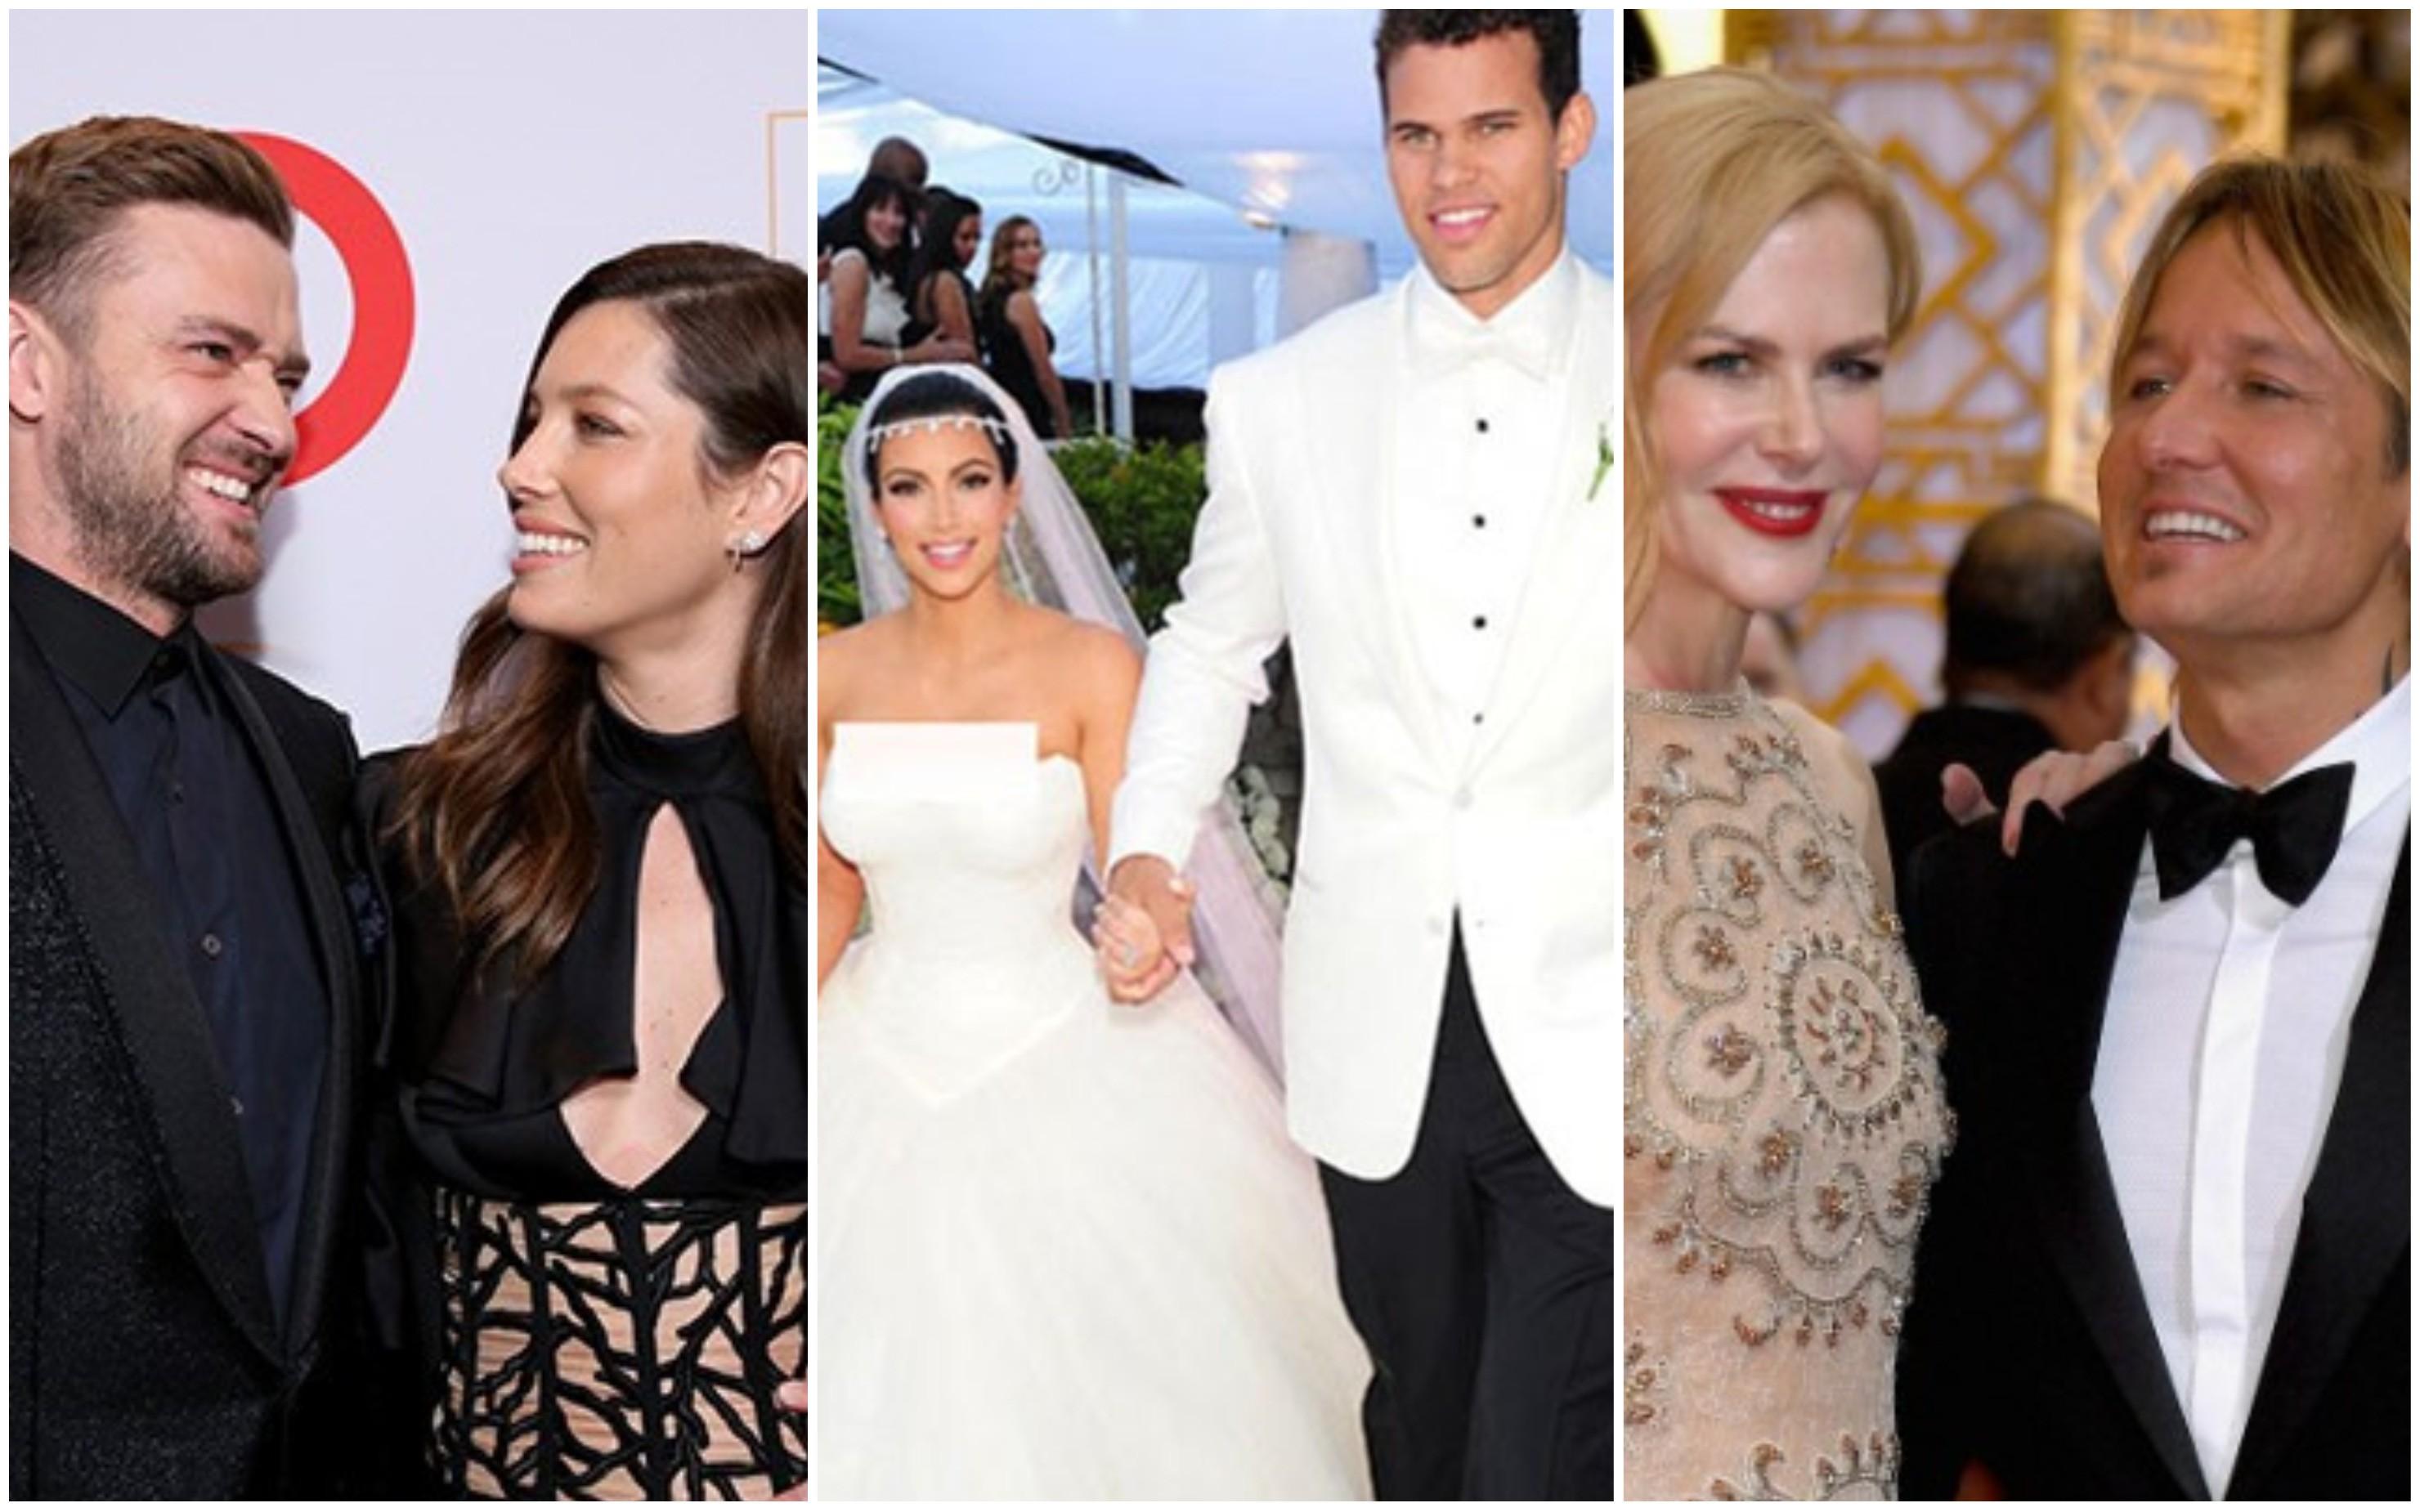 Justin Timberlake e Jessica Biel, Kim Kardashian e Kris Humphries, Nicole KIdman e Keith Urban (Foto: Getty Images)